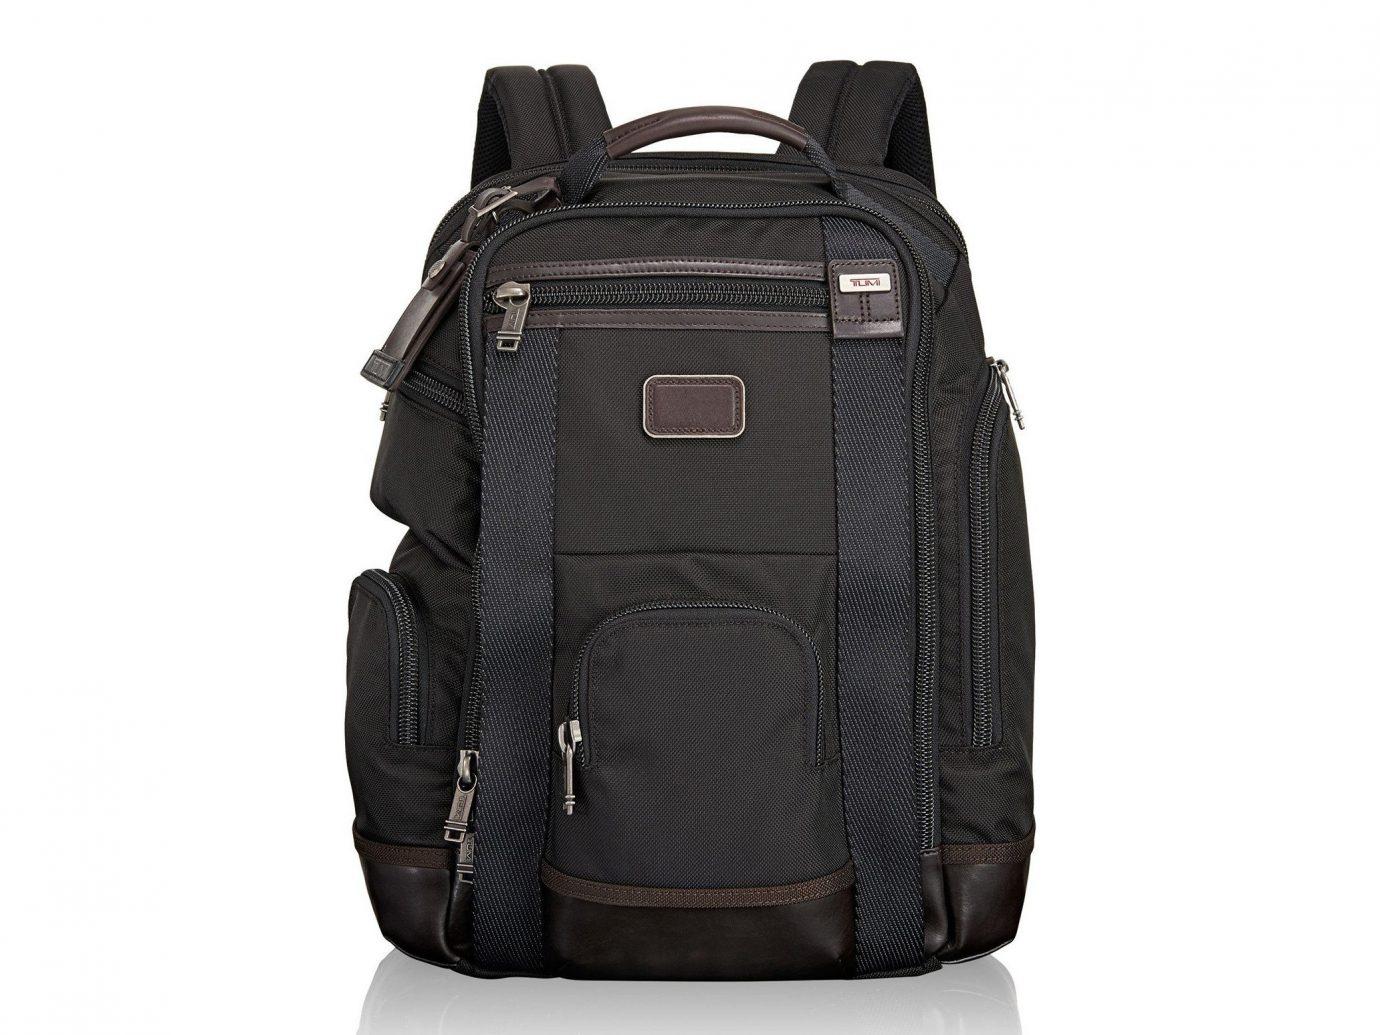 Style + Design bag luggage indoor suitcase backpack product messenger bag pocket hand luggage leather product design luggage & bags baggage shoulder bag accessory